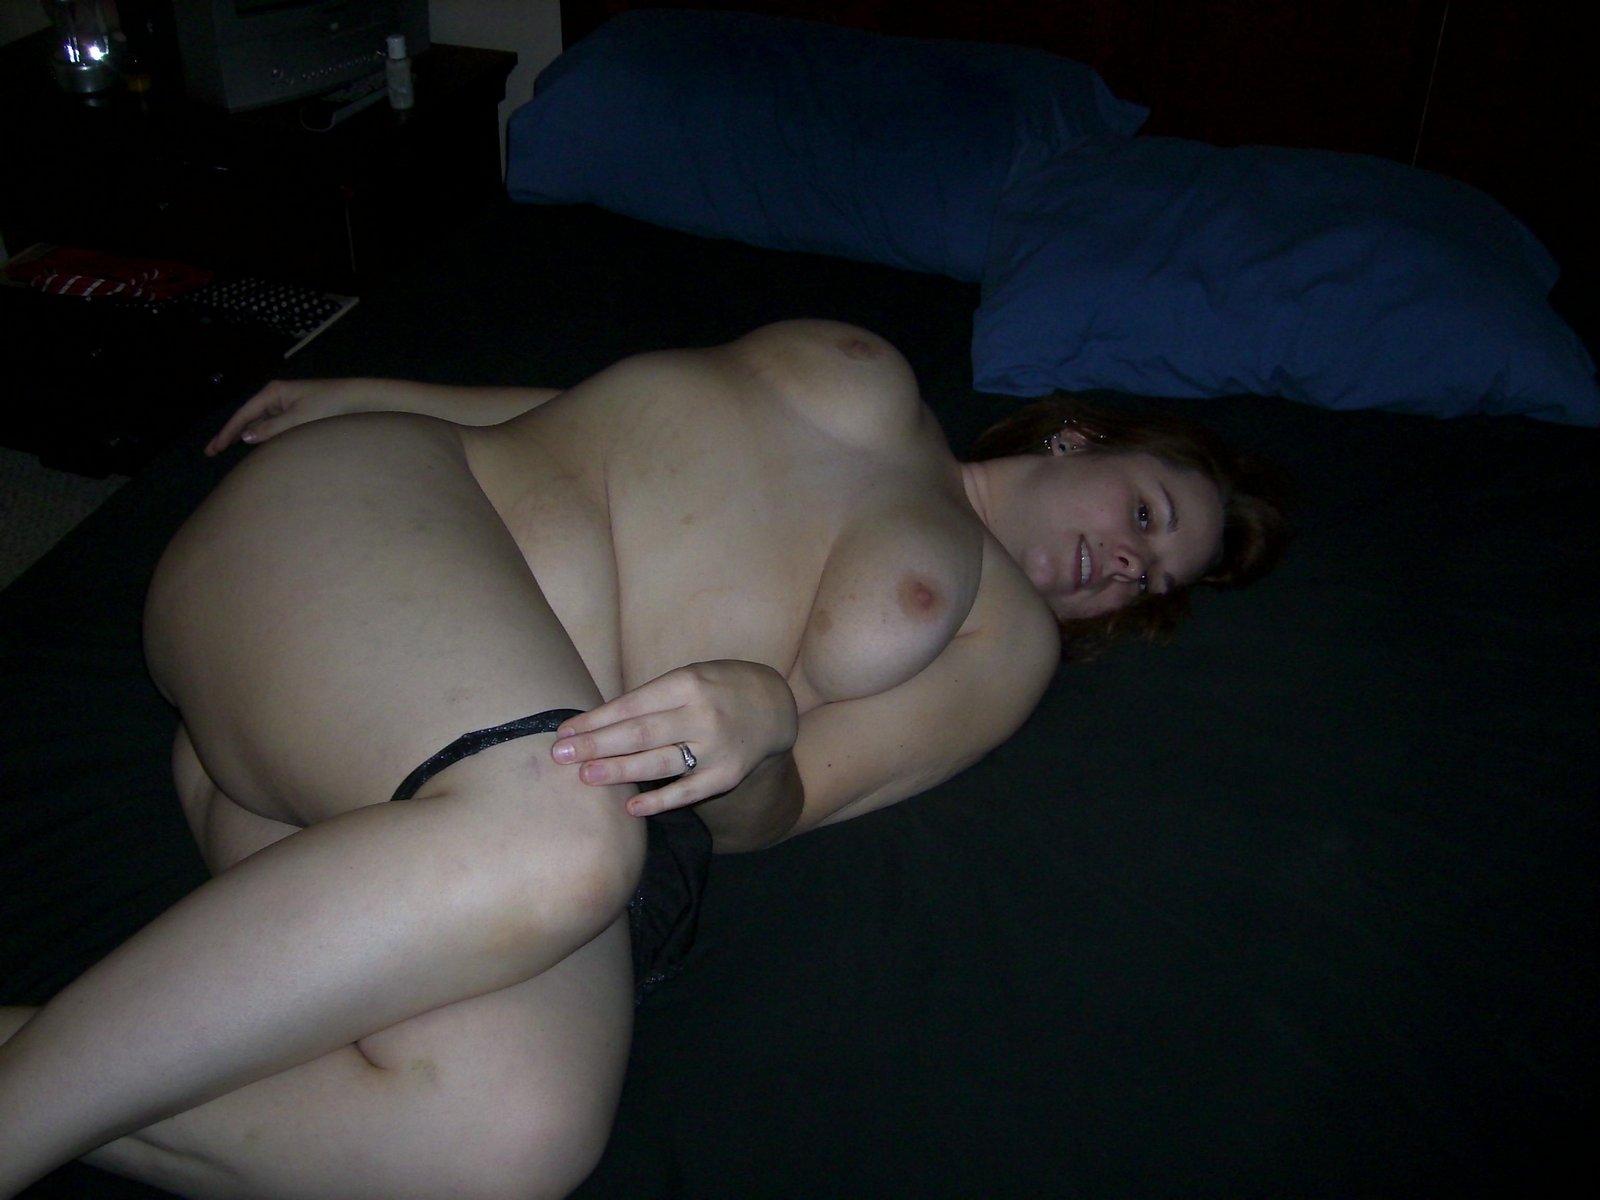 cewek bule bertubuh chubby telanjang pamer payudara gede dan kemolekan tubuhnya